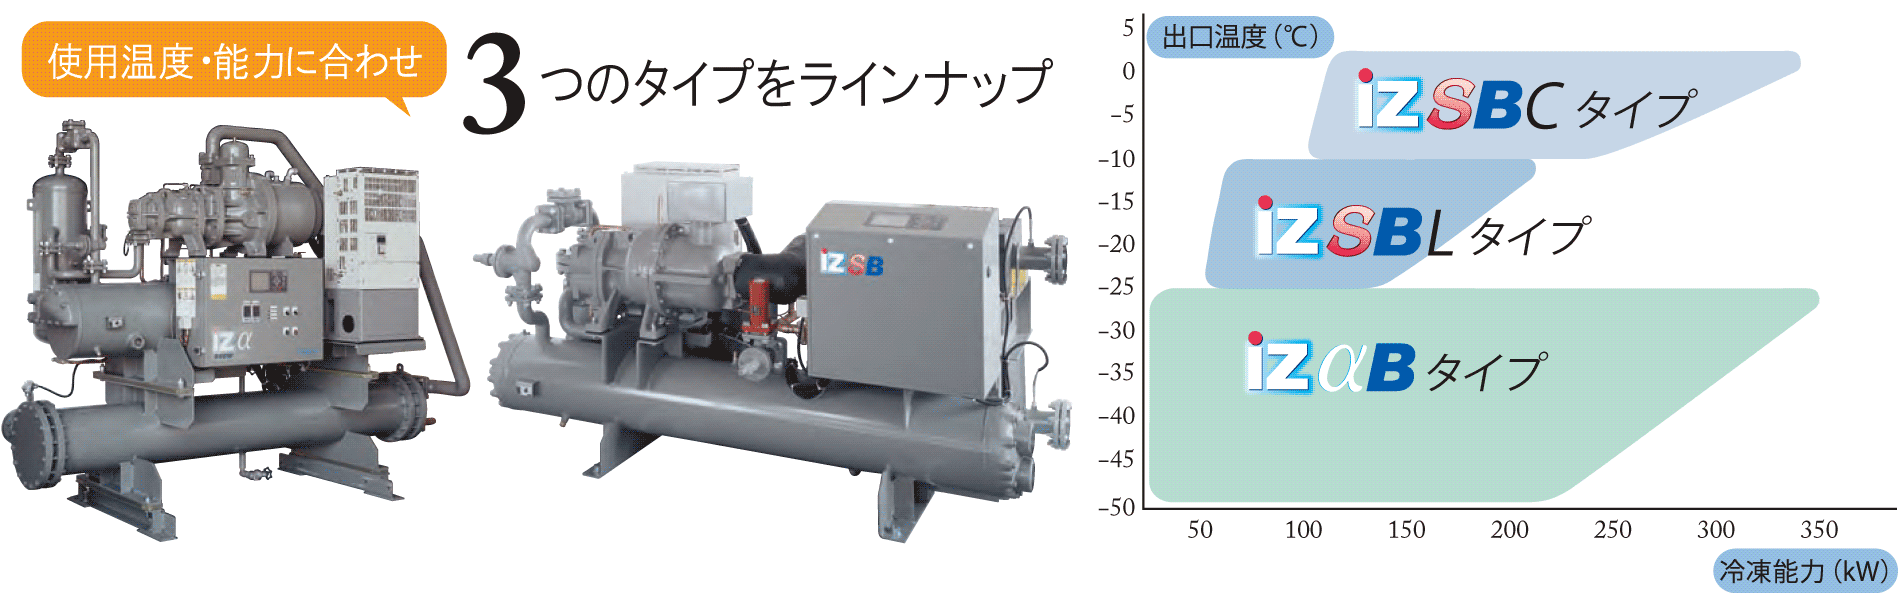 KOBELCOのスクリュブラインチラーユニットは、使用温度・能力に合わせ3つのタイプをラインナップ